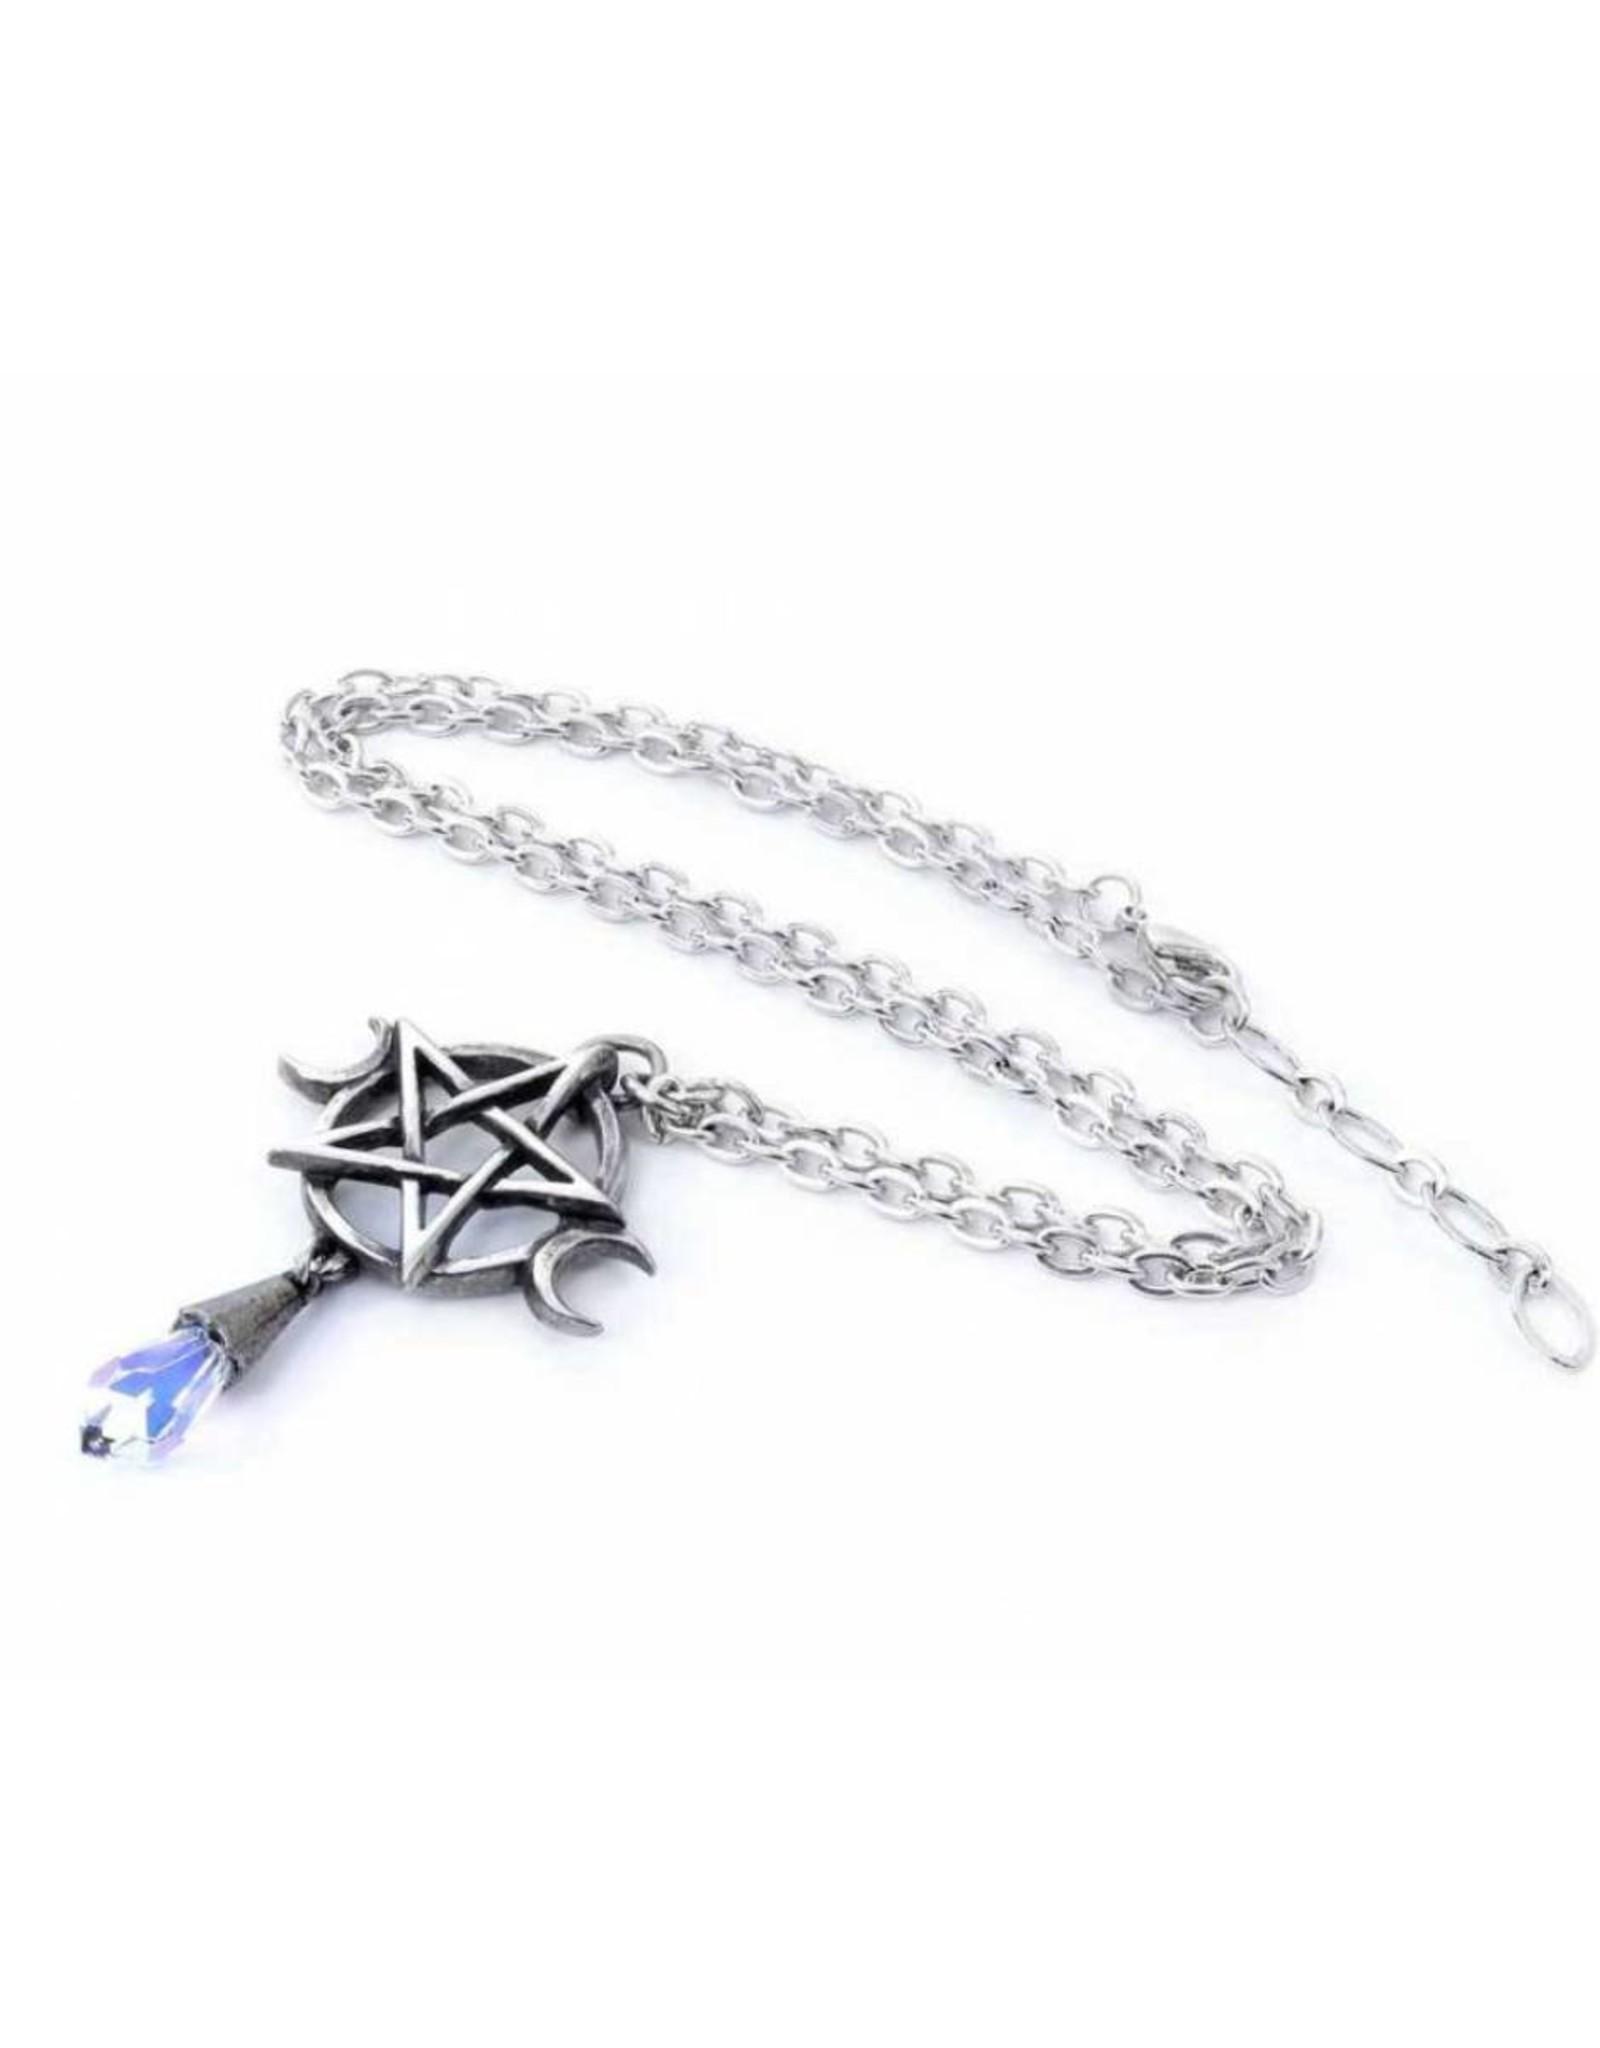 Alchemy Wicca en occult sieraden -  Goddess hanger en ketting Alchemy